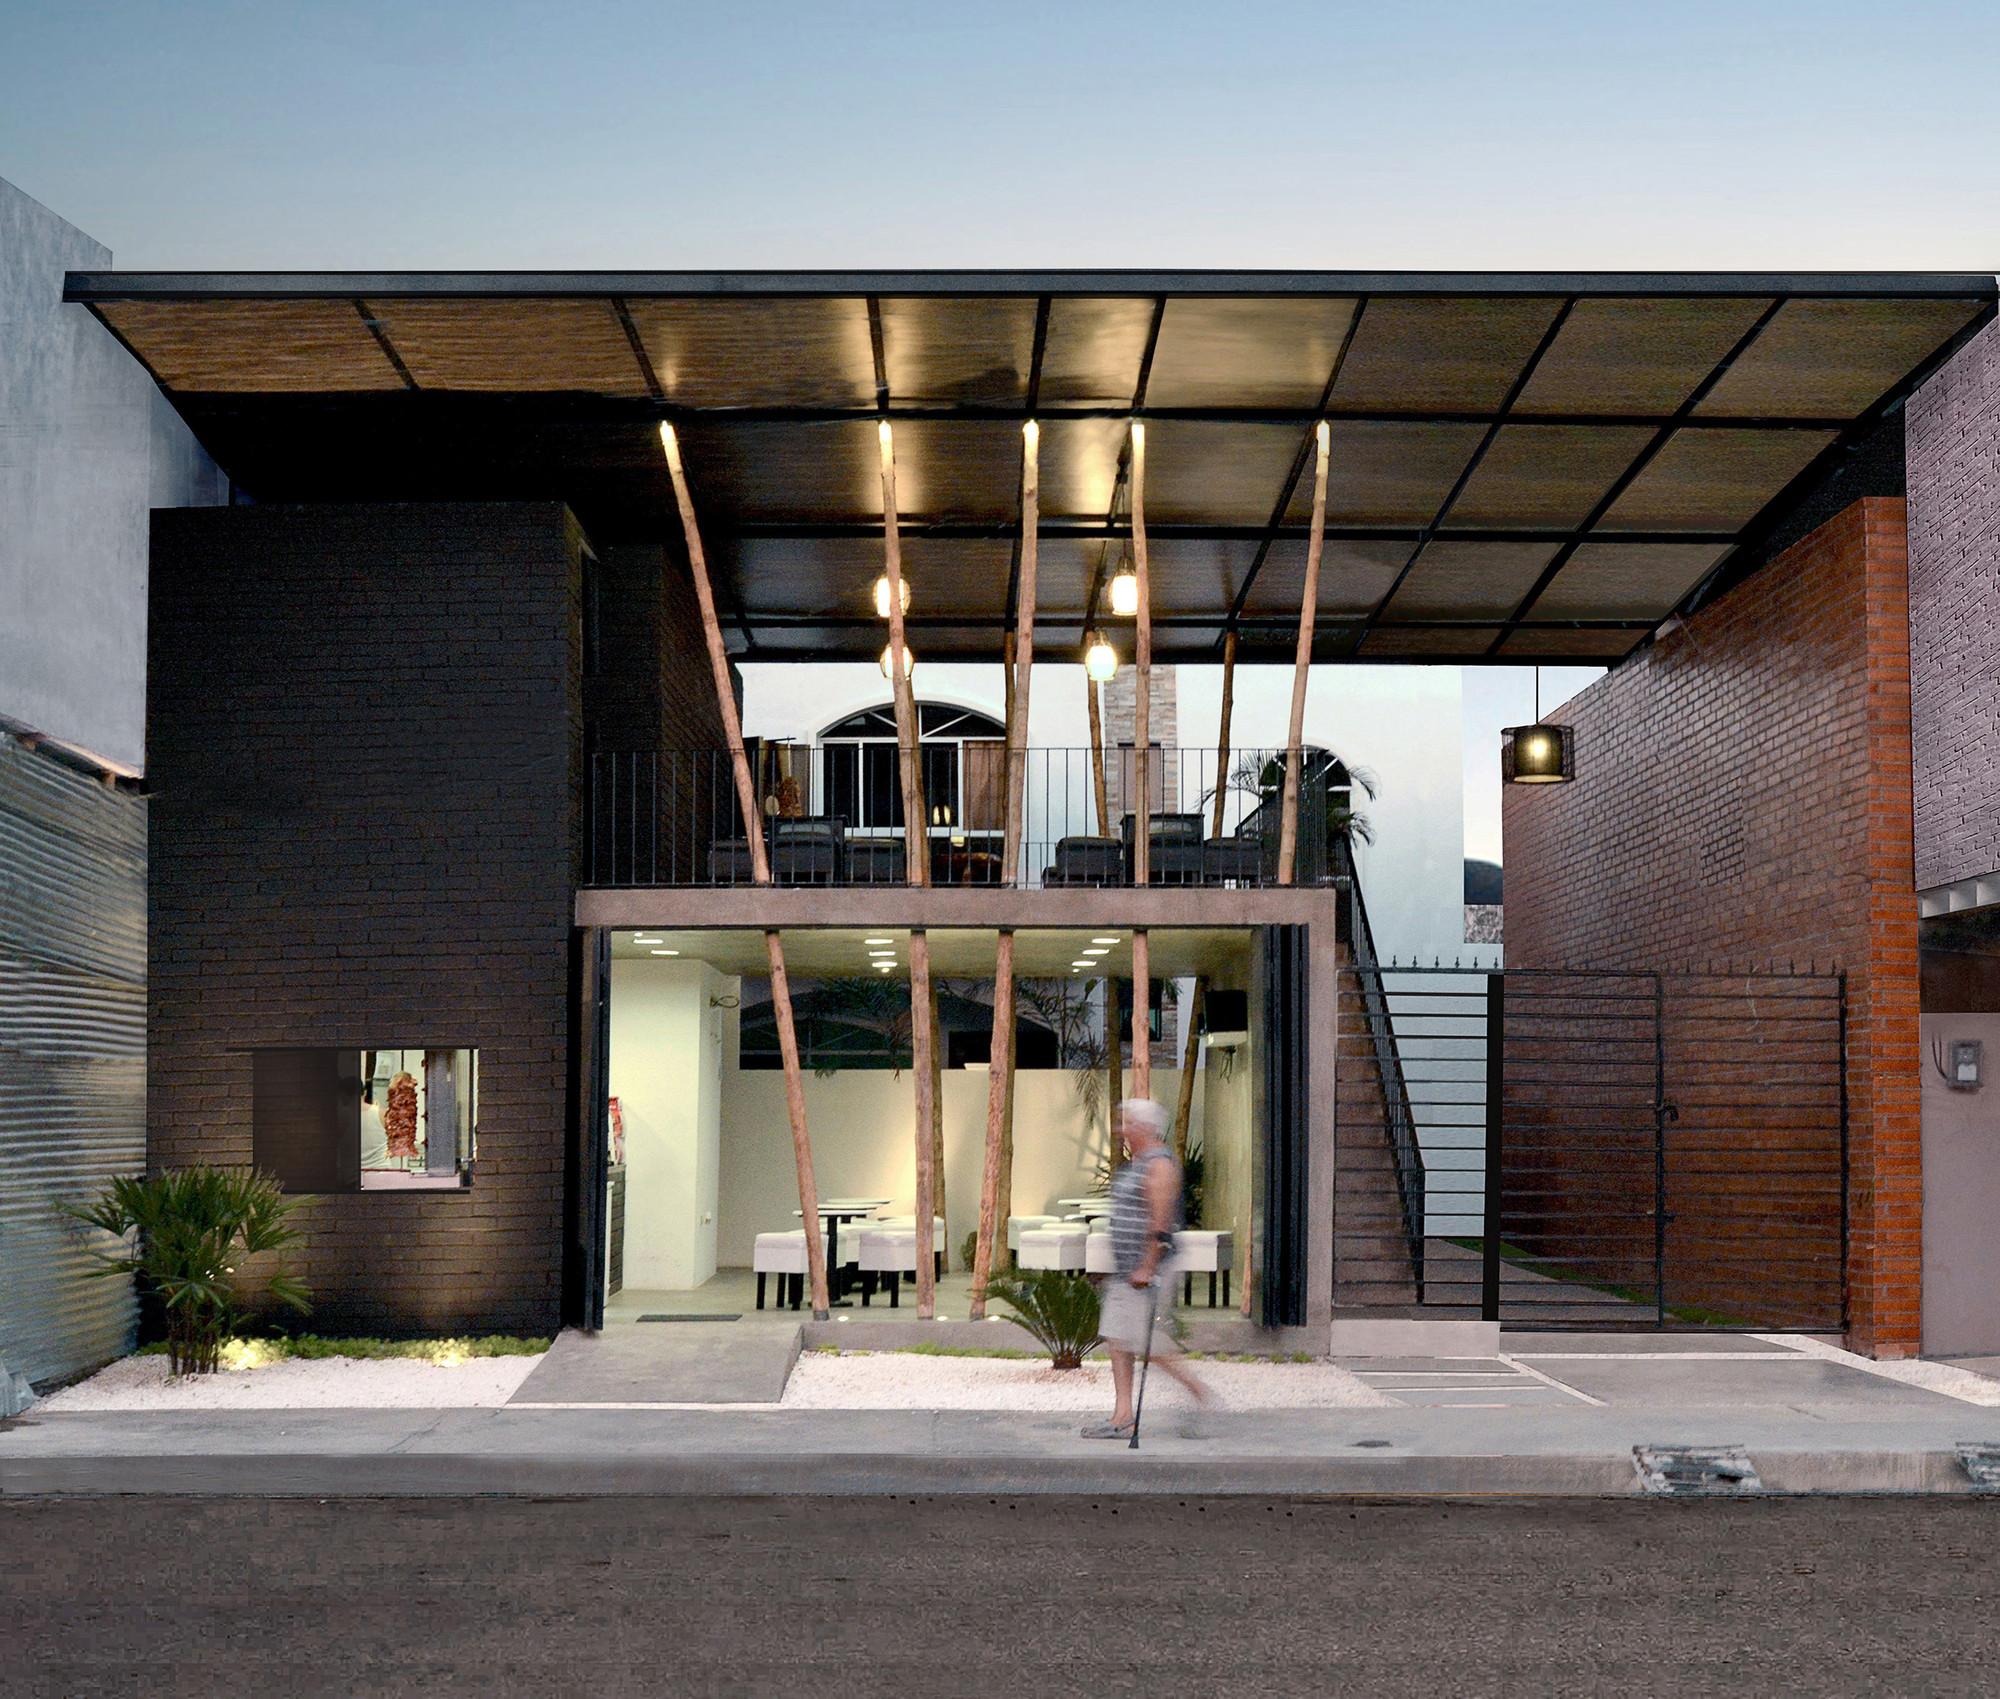 Restaurante Don Shawarma / Natura Futura Arquitectura, © Juan Alberto Andrade